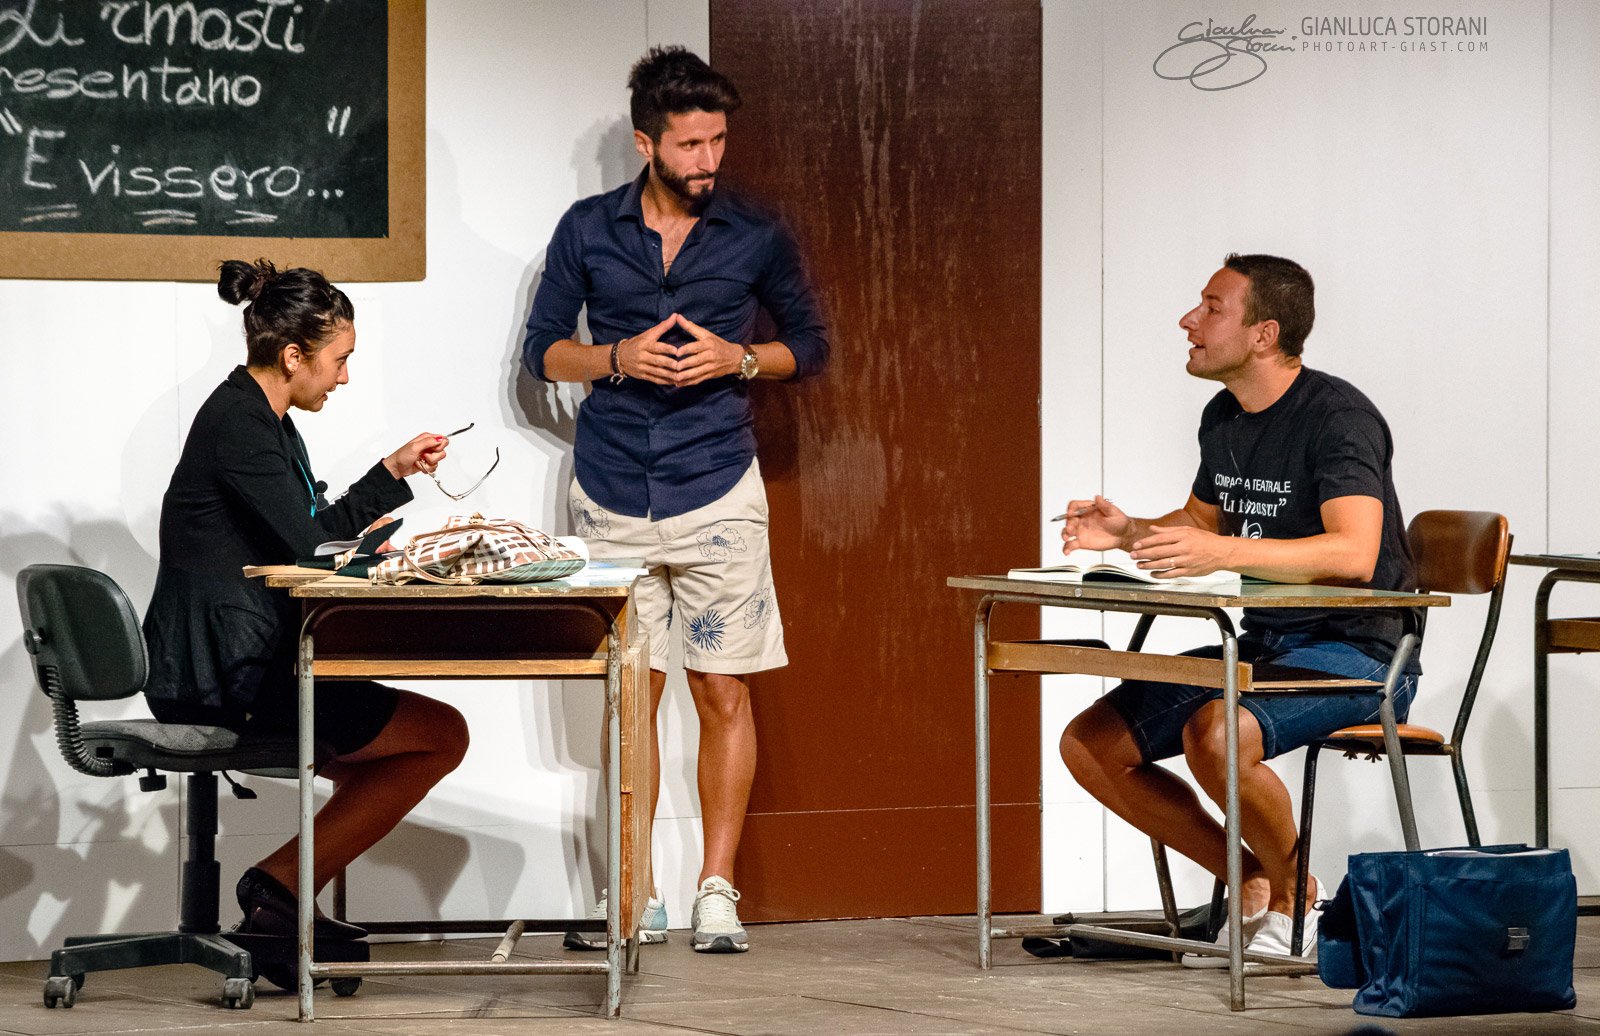 Dialetto che piacere 2017 - Gianluca Storani Photo Art  (ID: 4-2222)